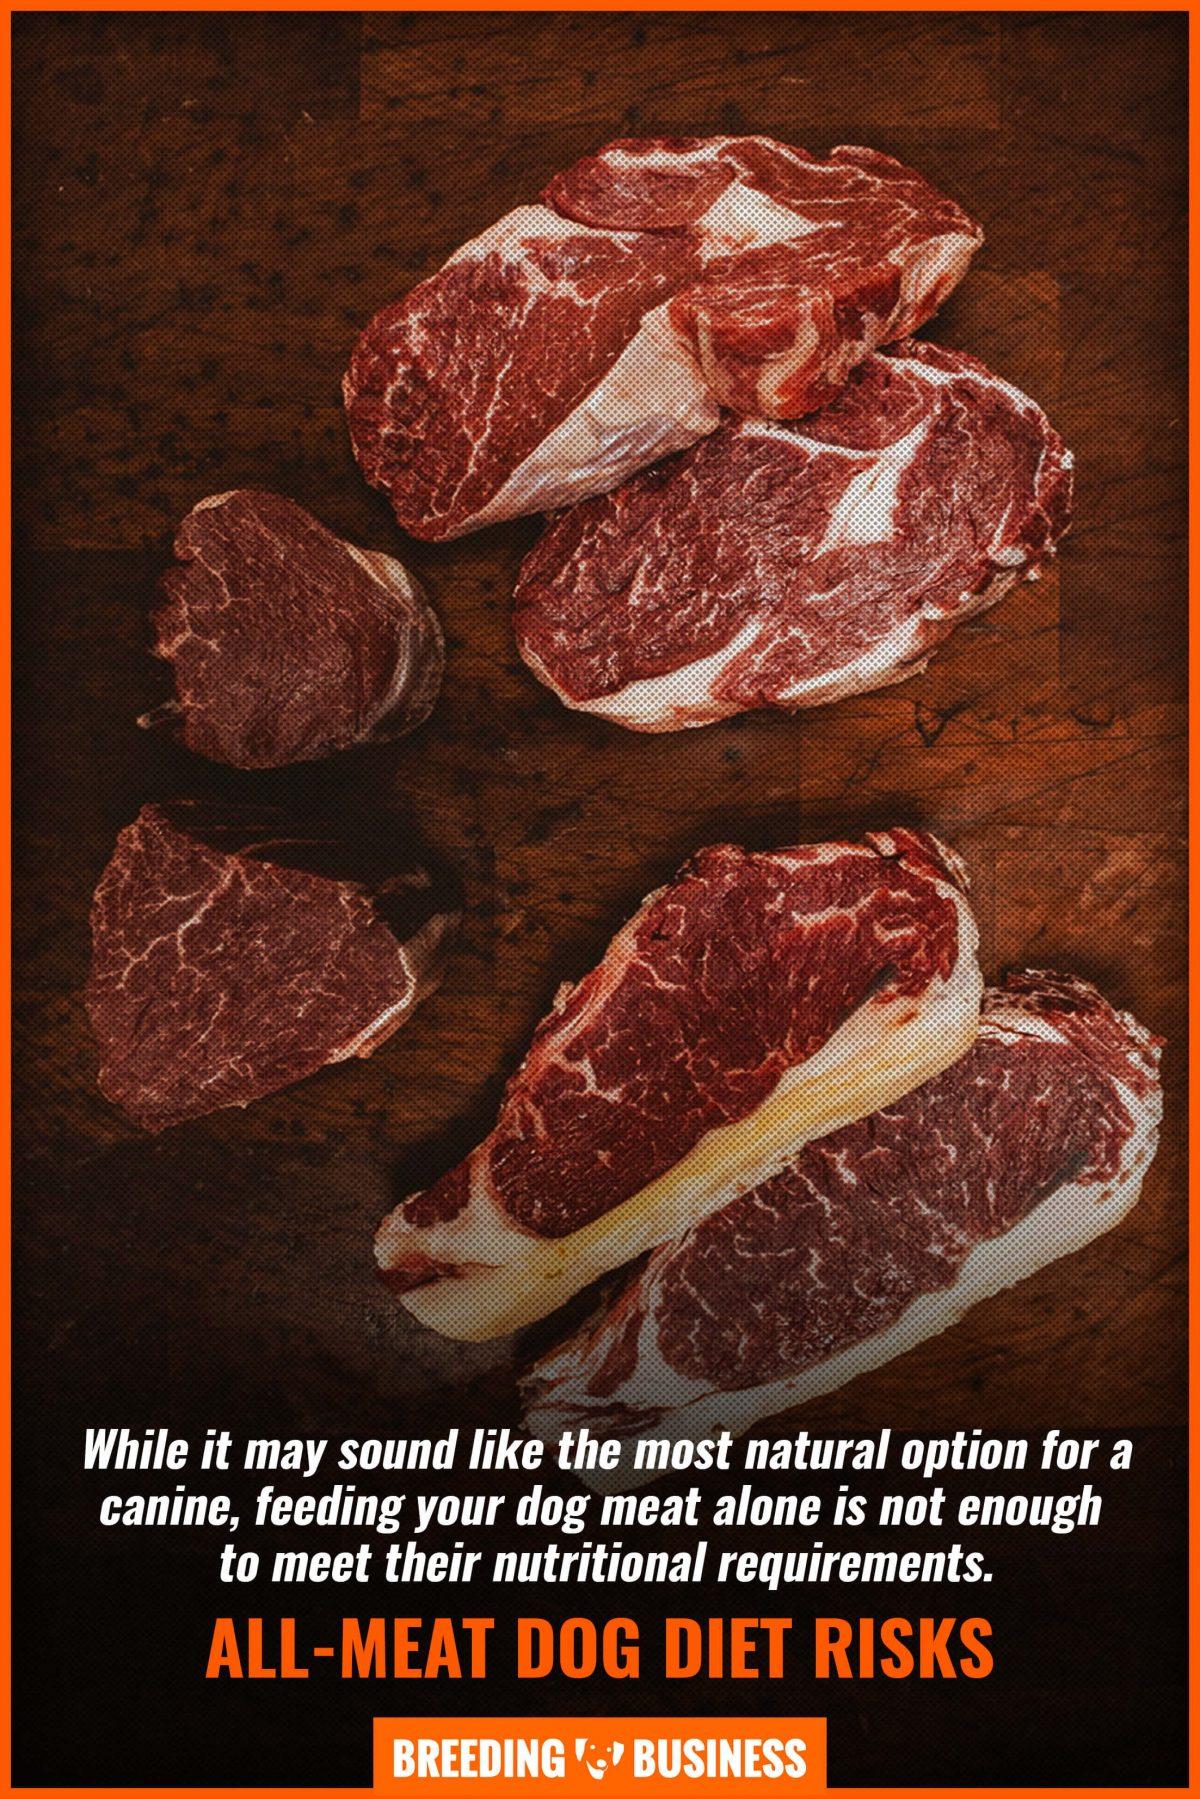 all-meat dog diet risks